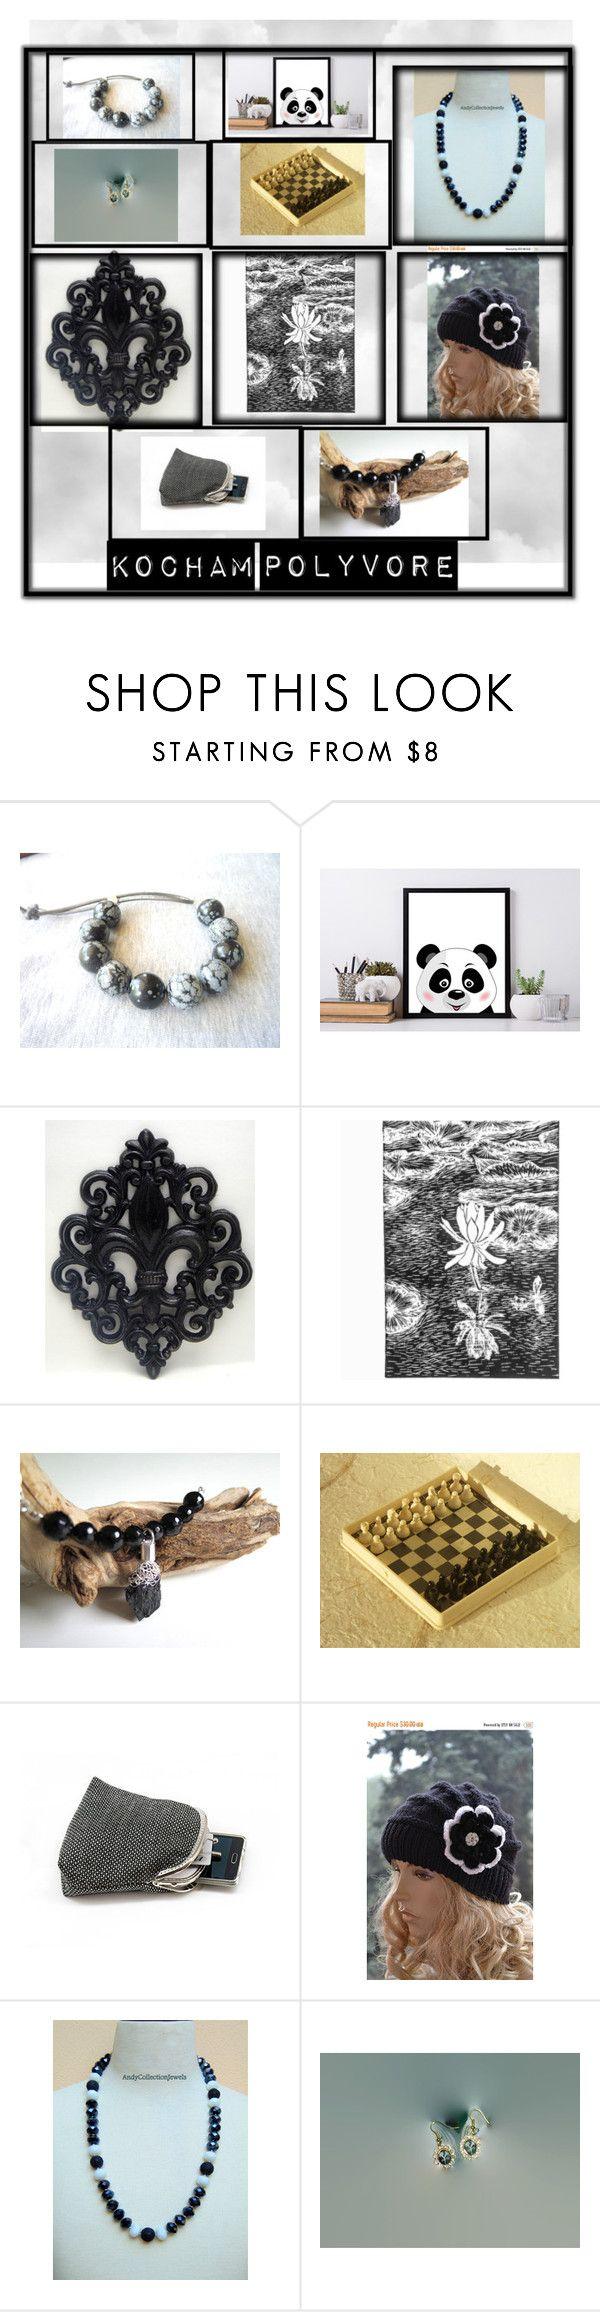 """Black & white etsy treasury"" by dorota-kujawa on Polyvore featuring etsy, polyvorecontest i yoinscollection"